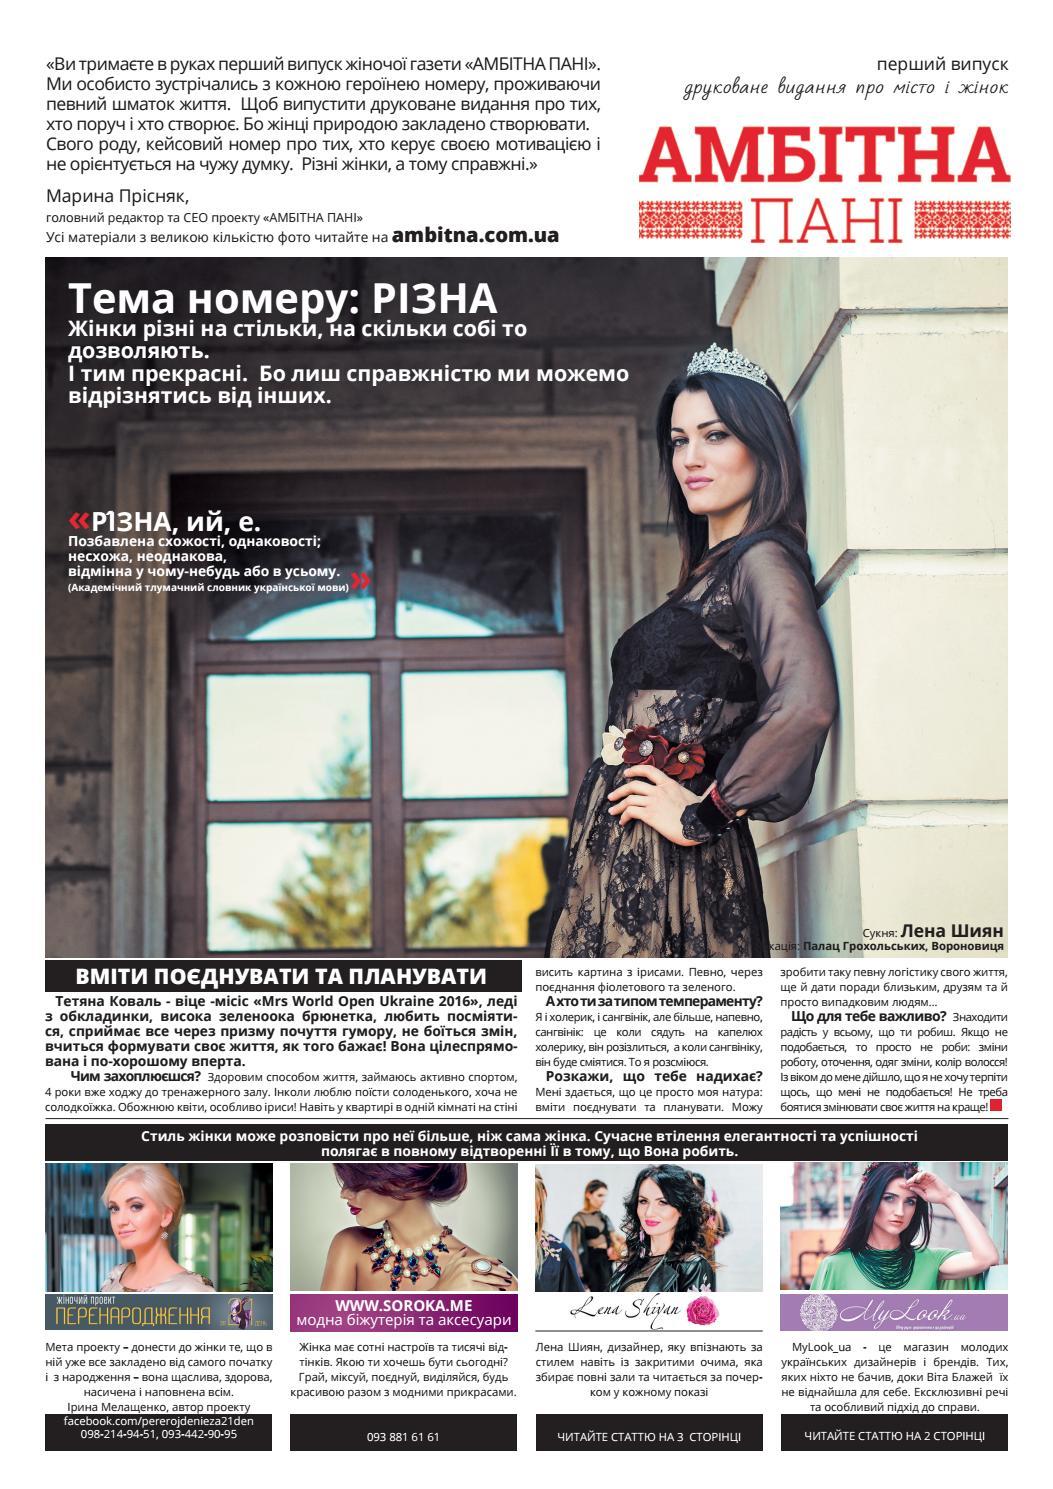 AMBITNA PANI.1 by Marina Prisnyak - issuu f64e6faec0941